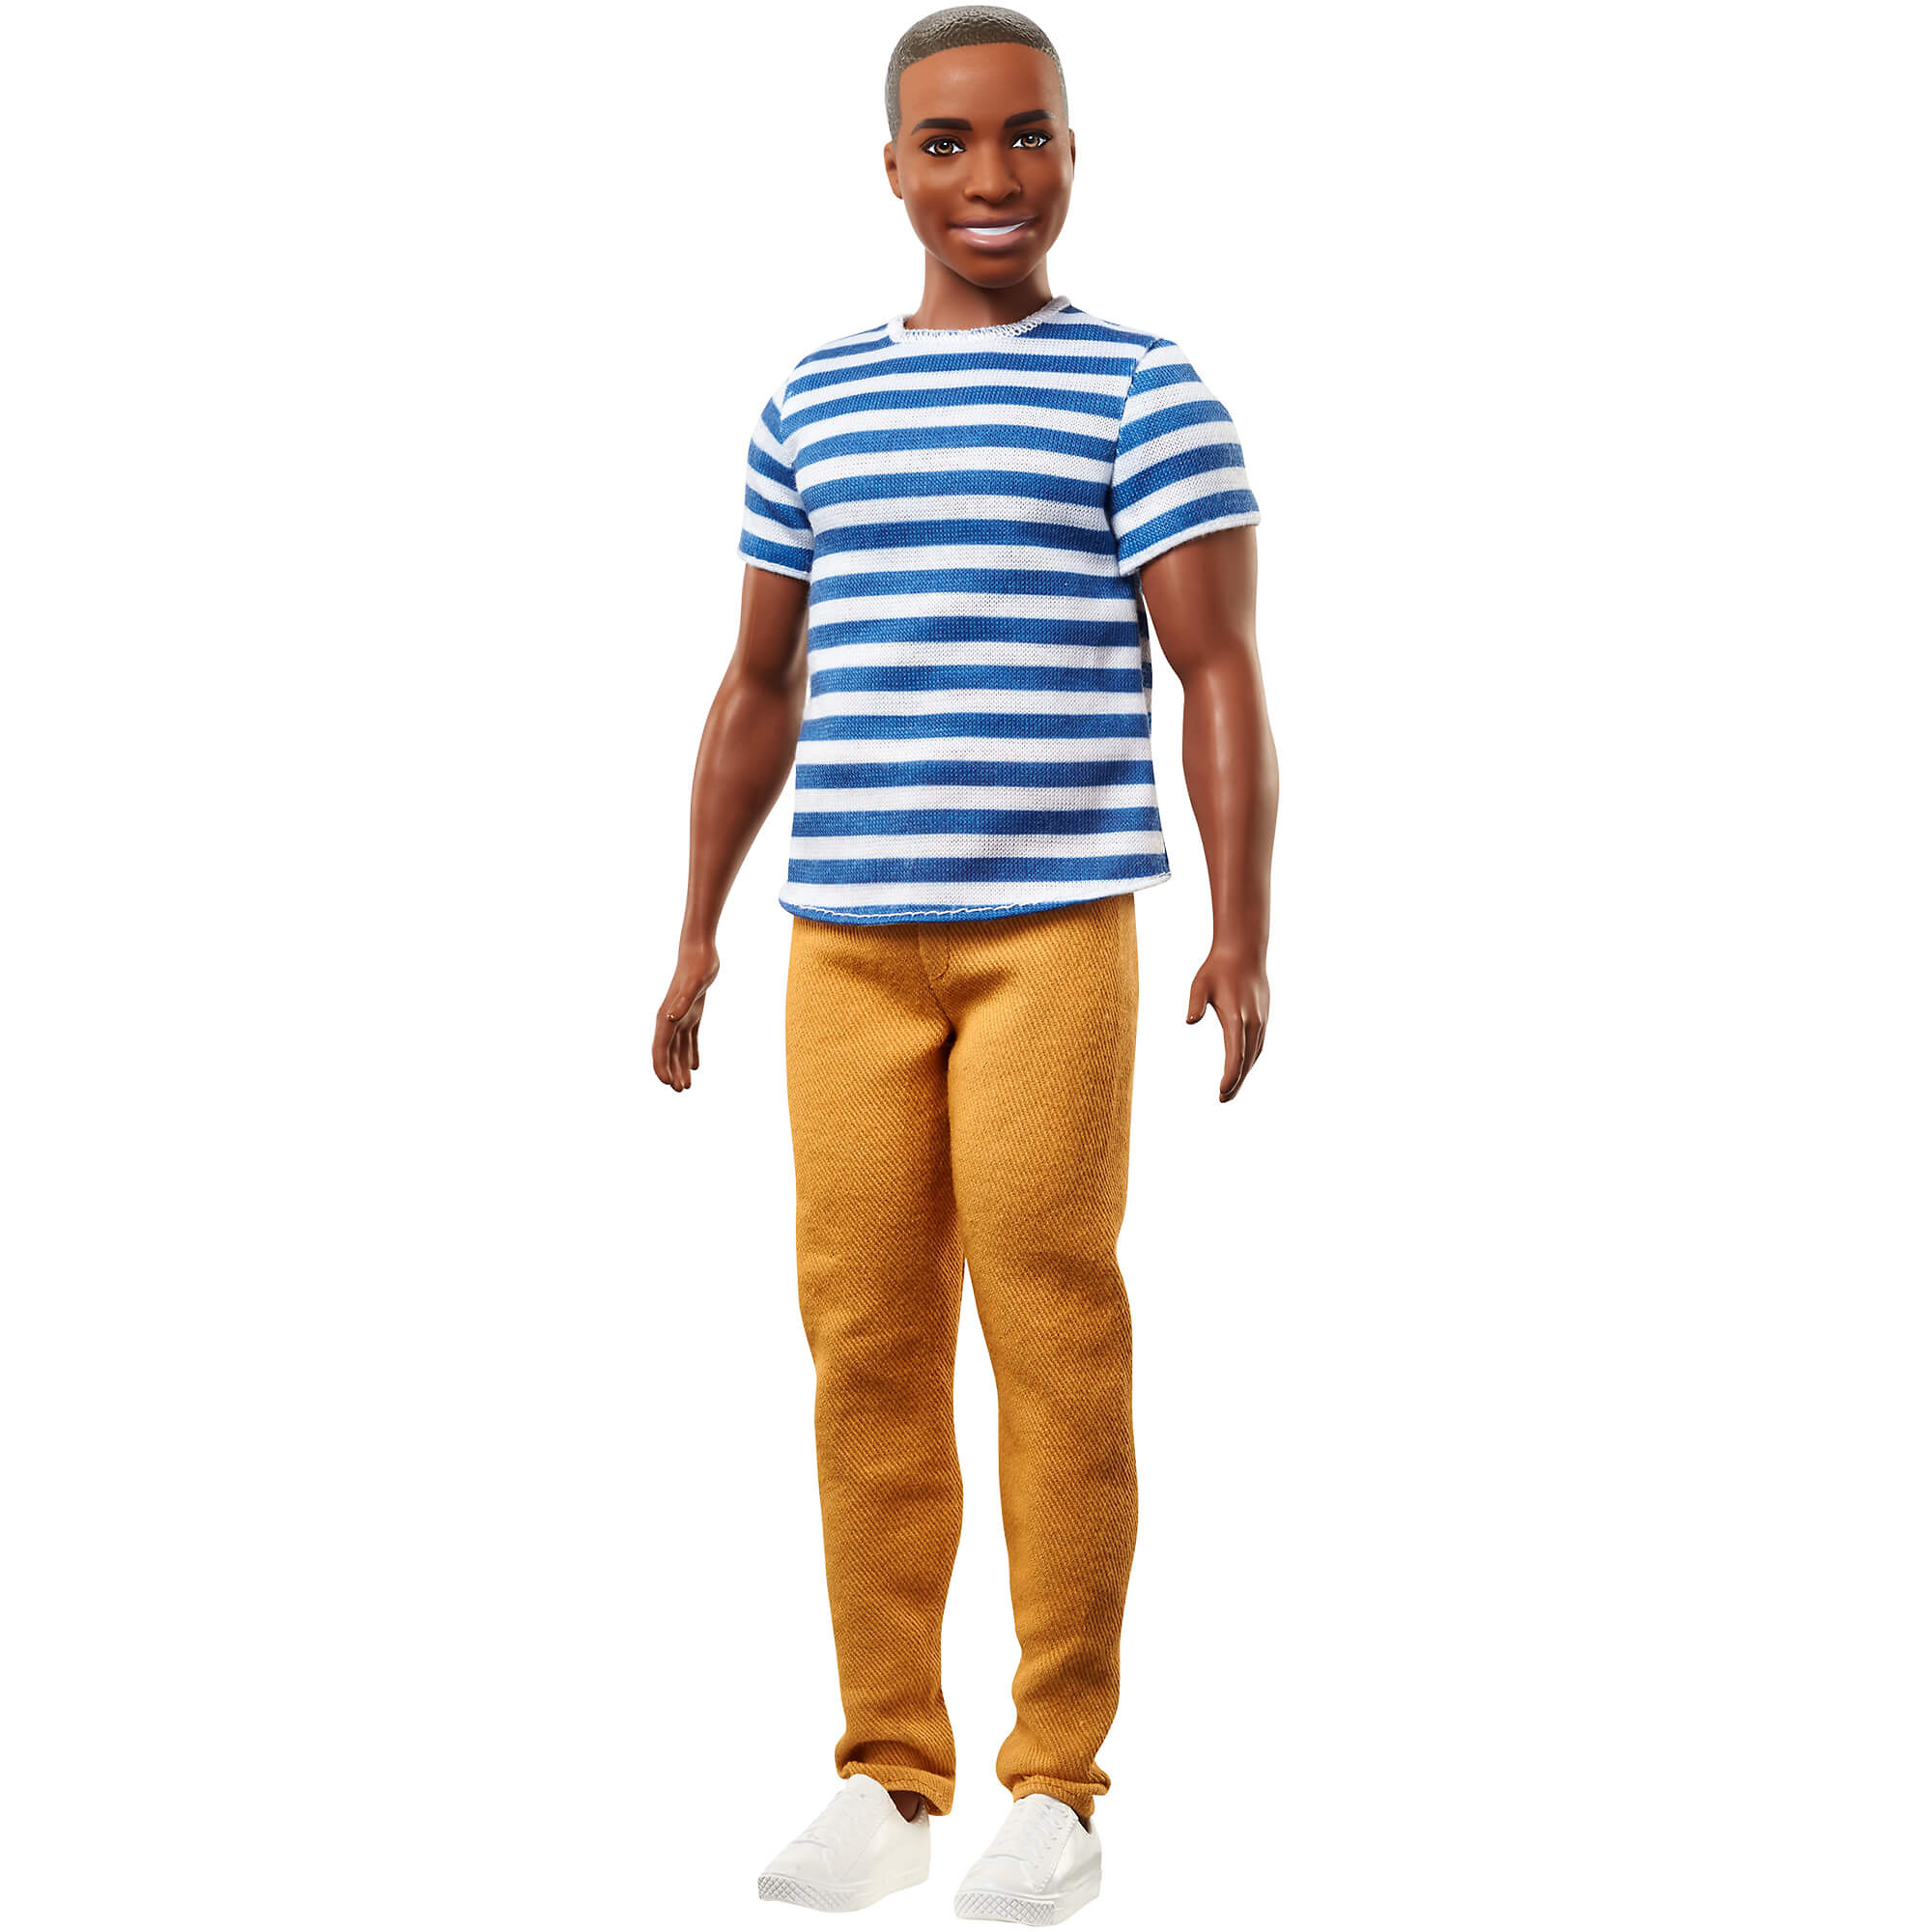 Ken Fashionistas Doll 5 Super Stripes Broad by Mattel